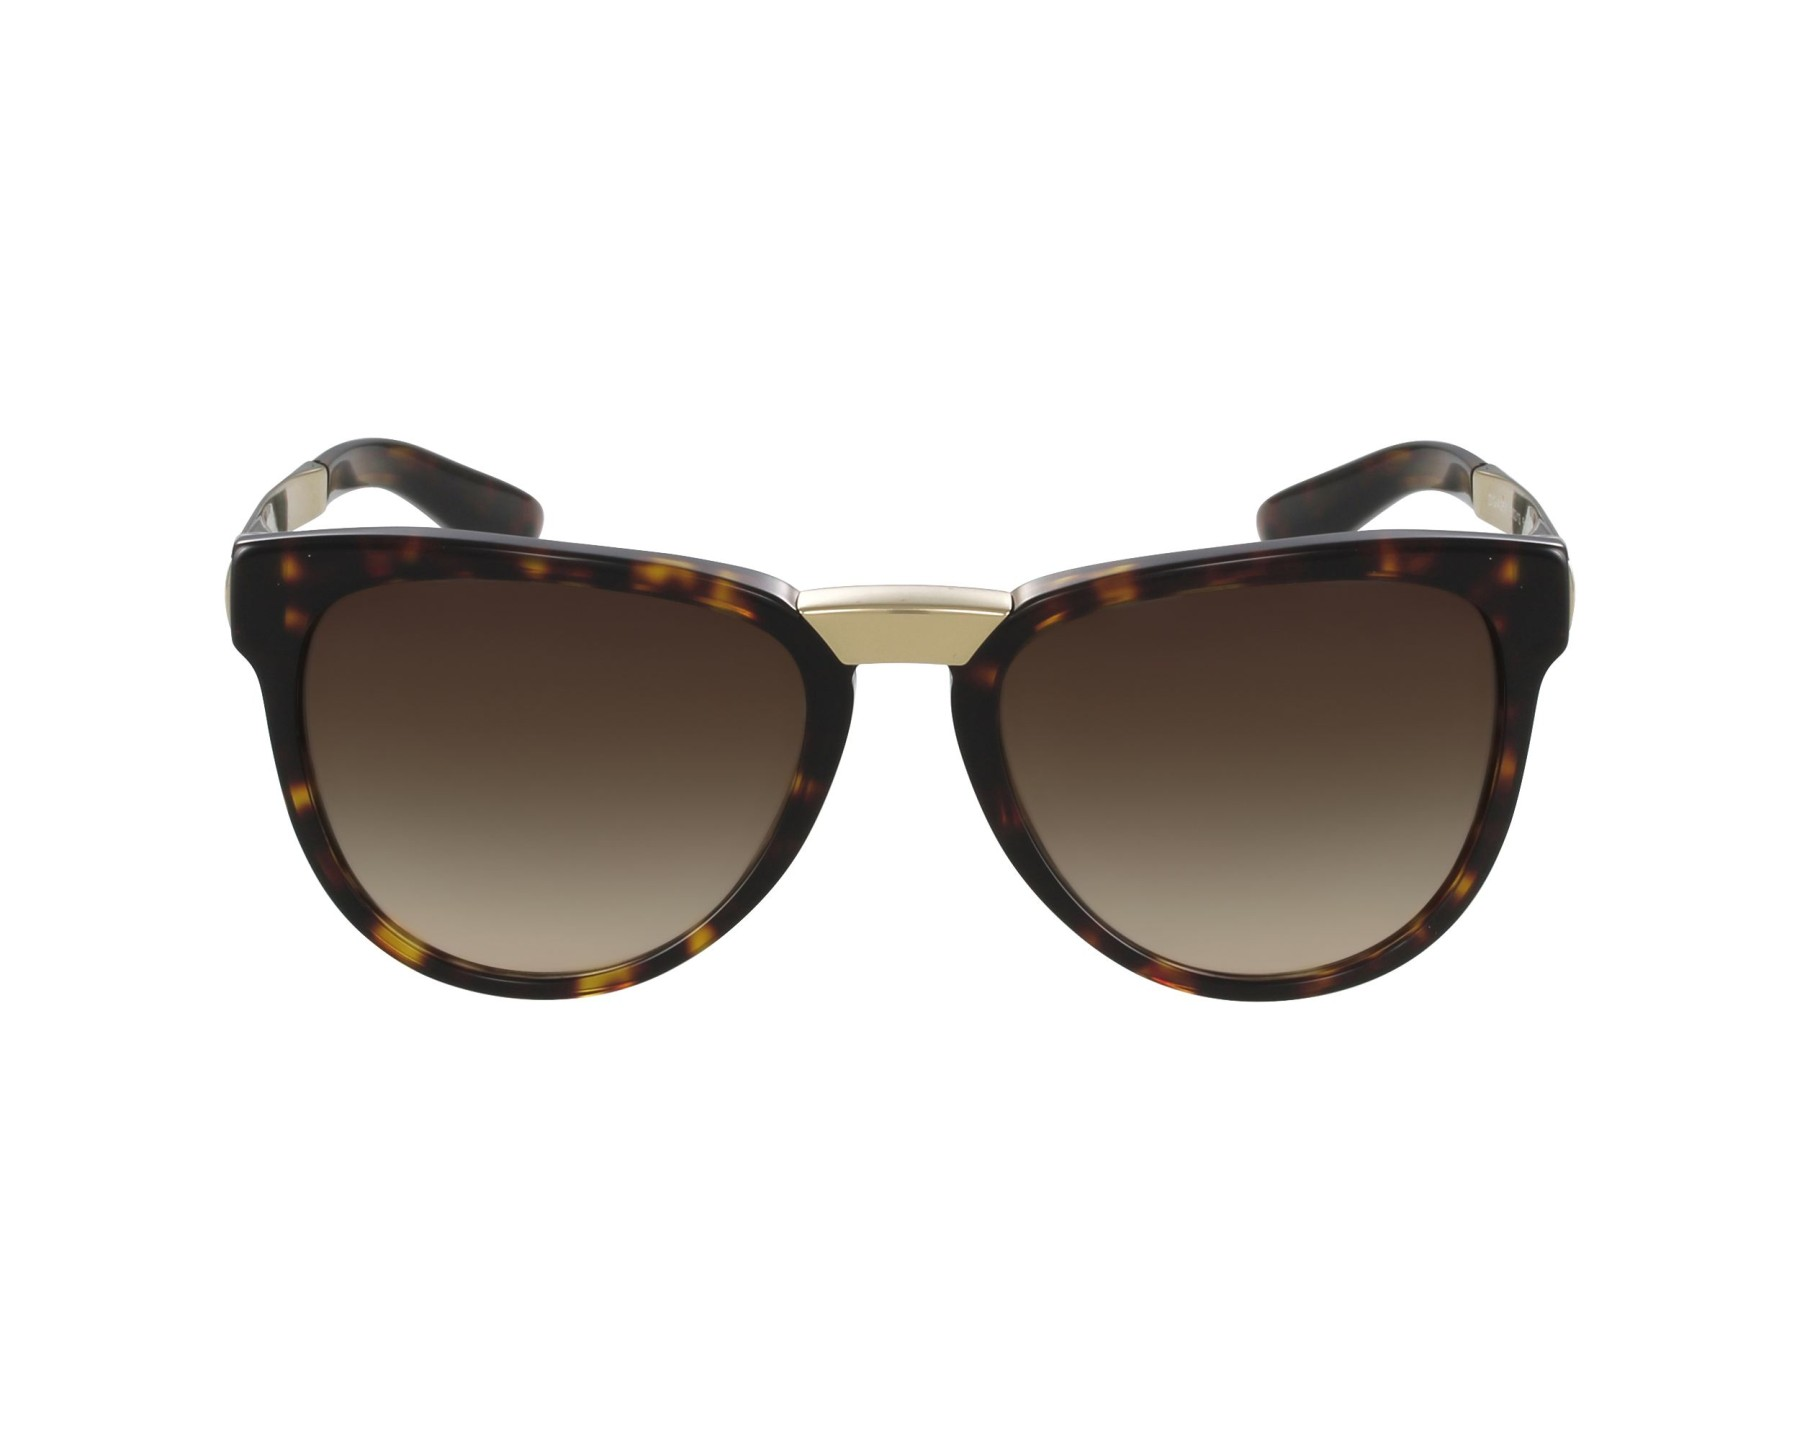 Dolce & Gabbana DG4257 502/13 54-18 agQSS